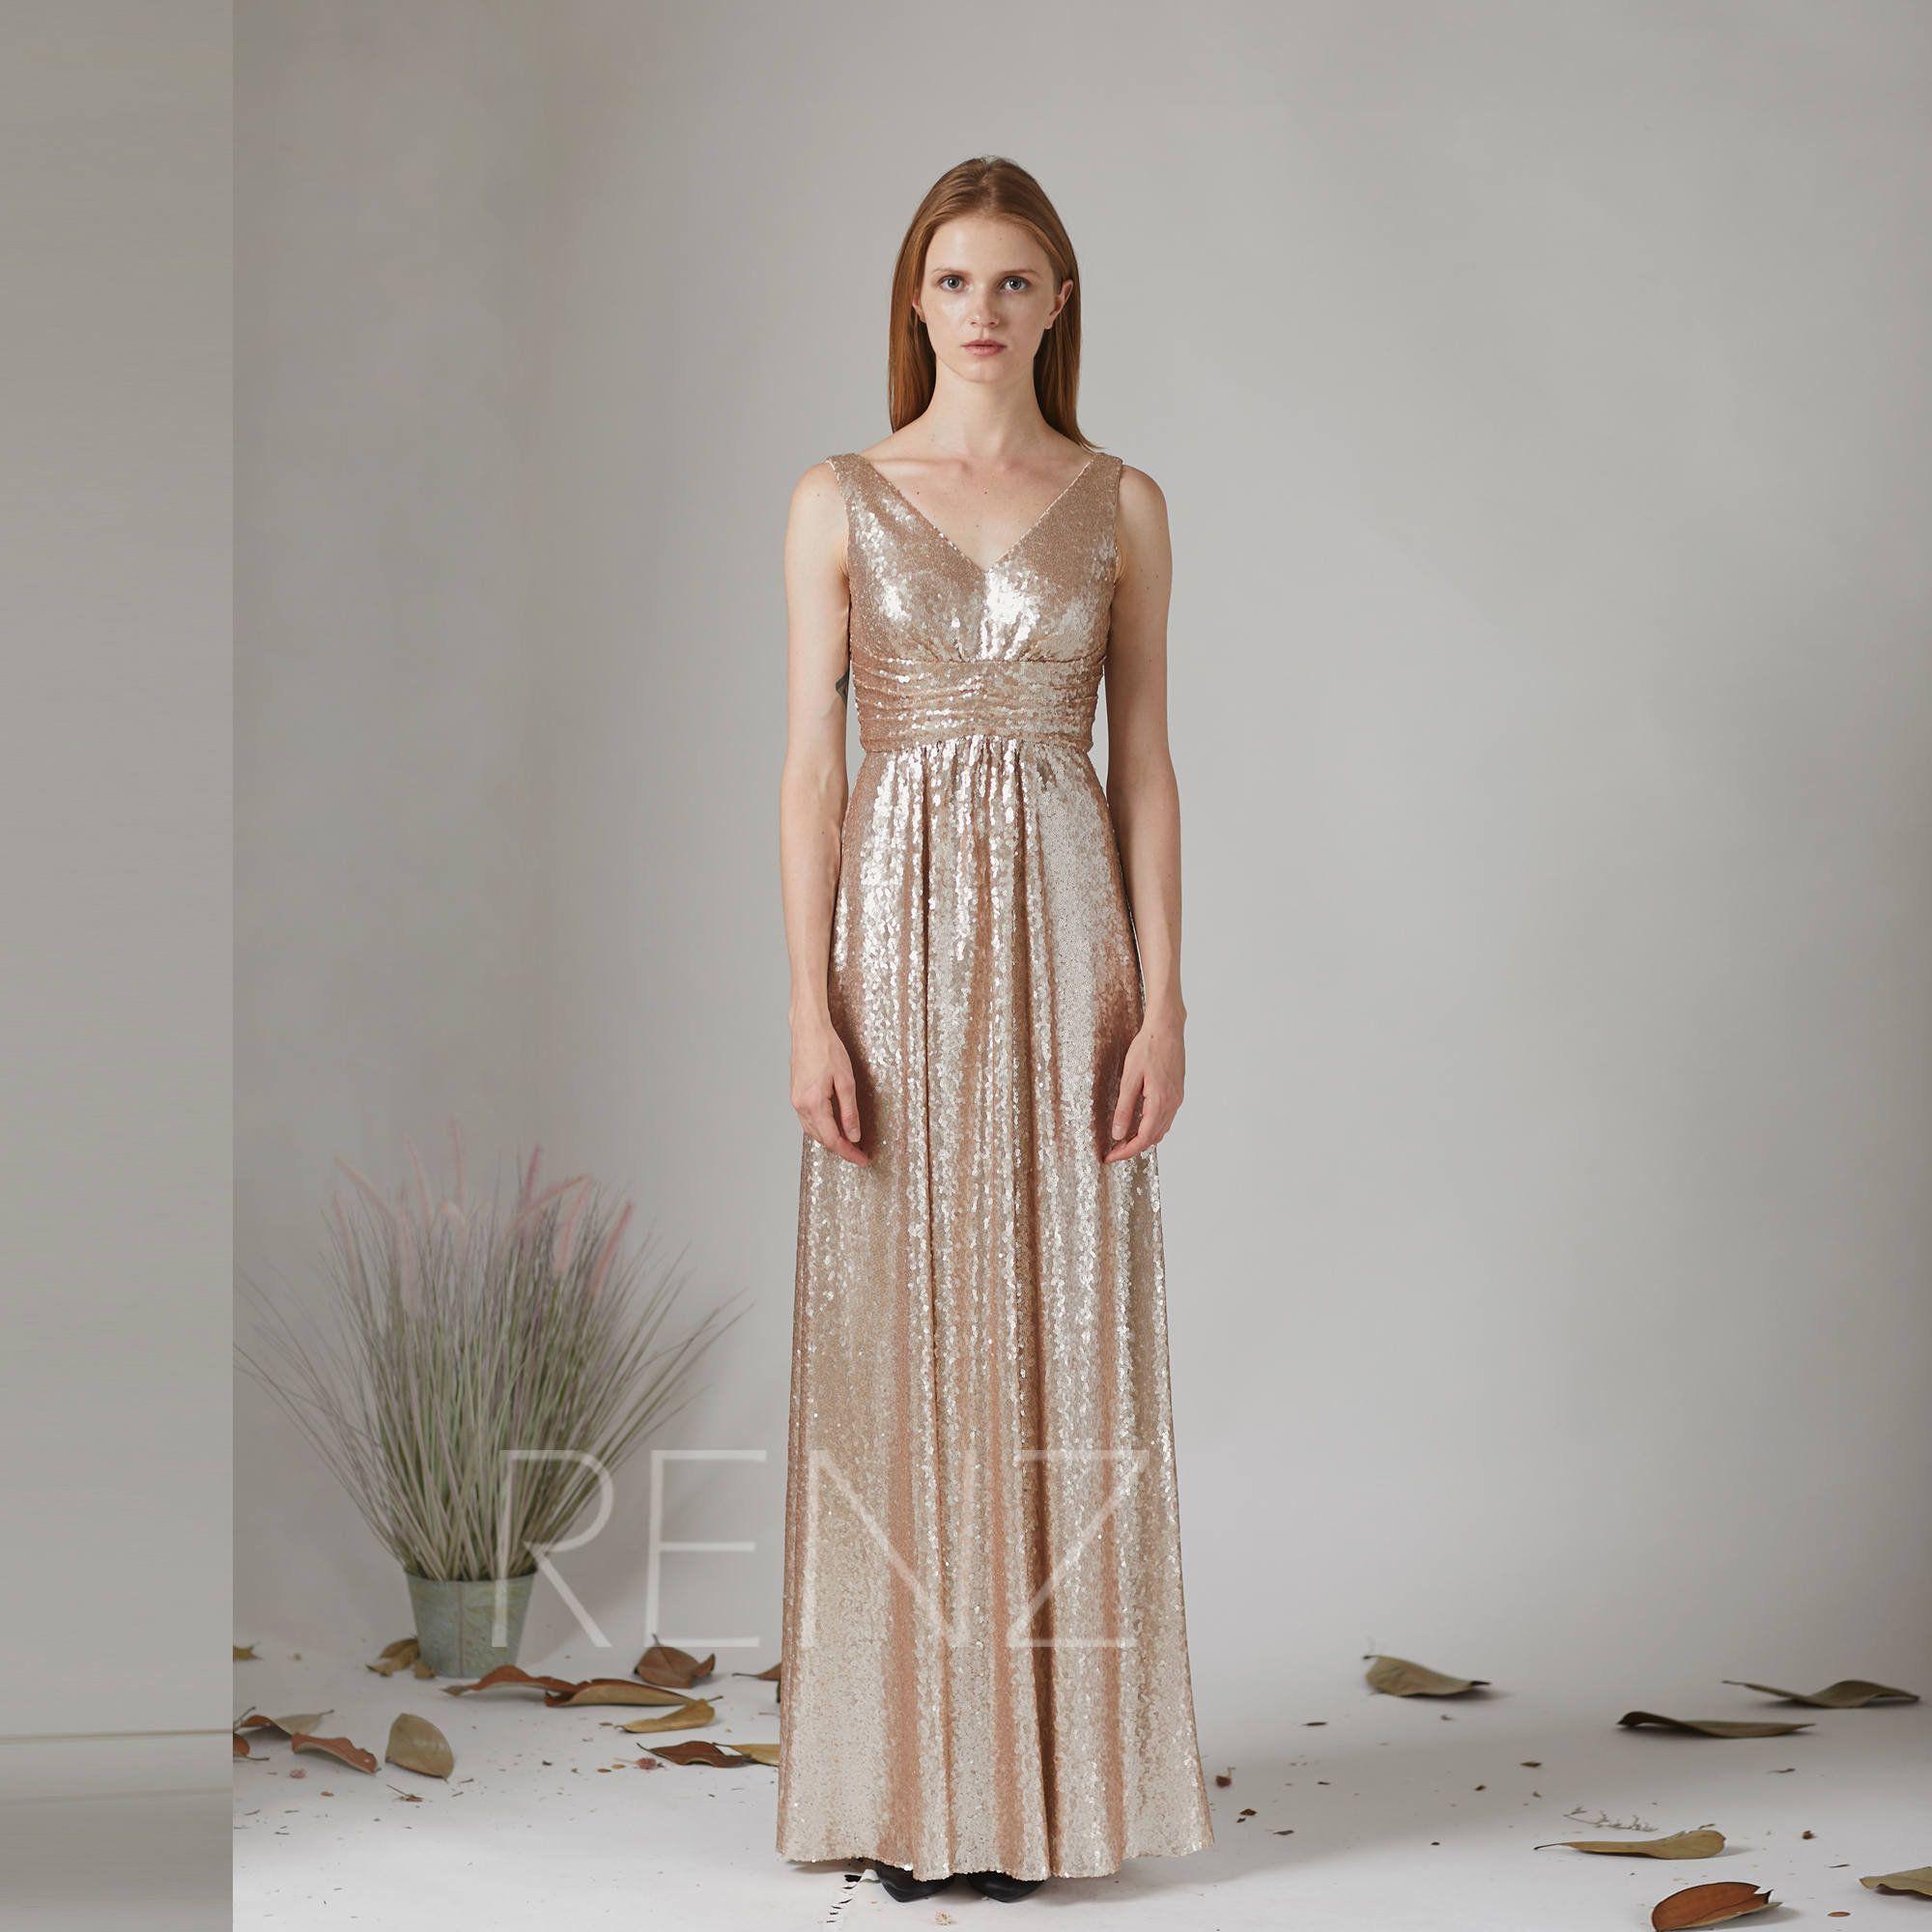 Party Dress Tan Sequin Prom Dress Ruched V Neck Gold Bridesmaid Dress V Back Evening Dress Sleeveless A Line Dresses Sequin Prom Dress Evening Dress Sleeveless [ 2000 x 2000 Pixel ]